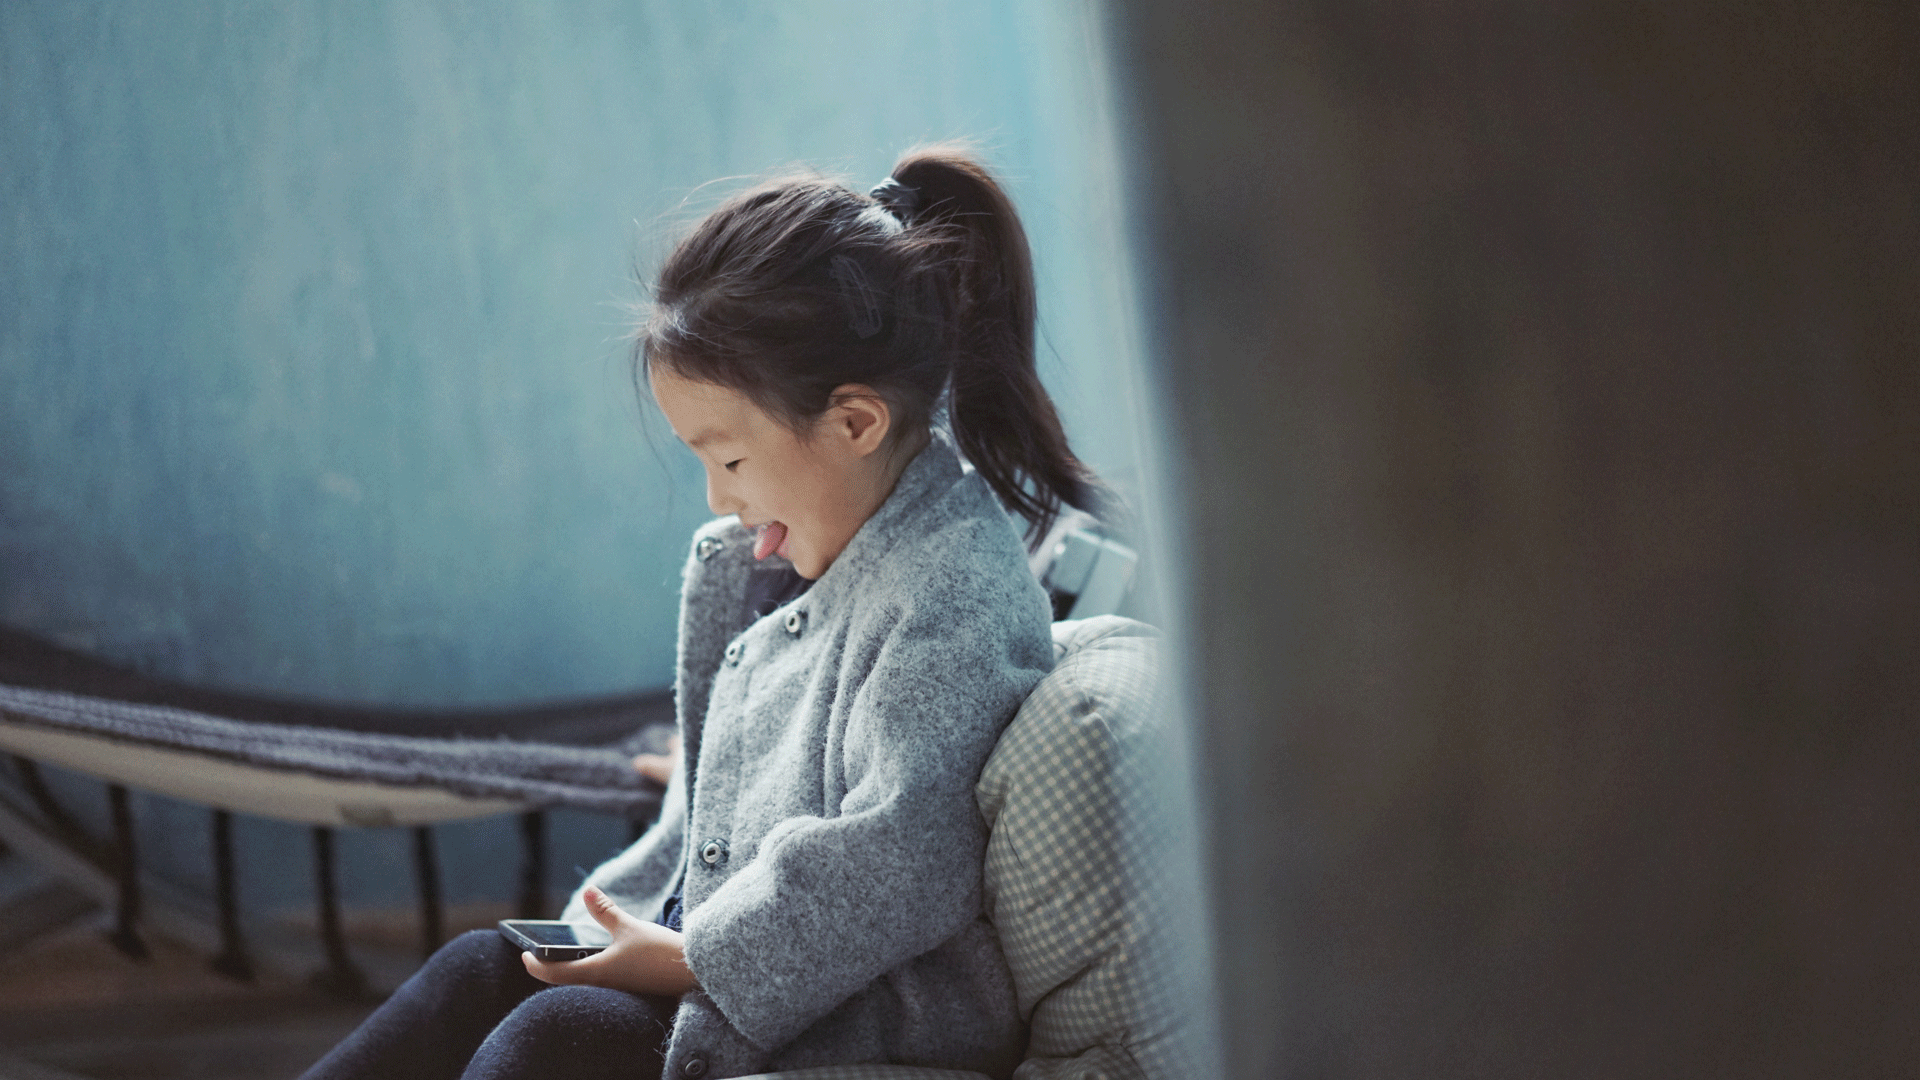 4 Tips: Guiding Kids Through Bad Influences